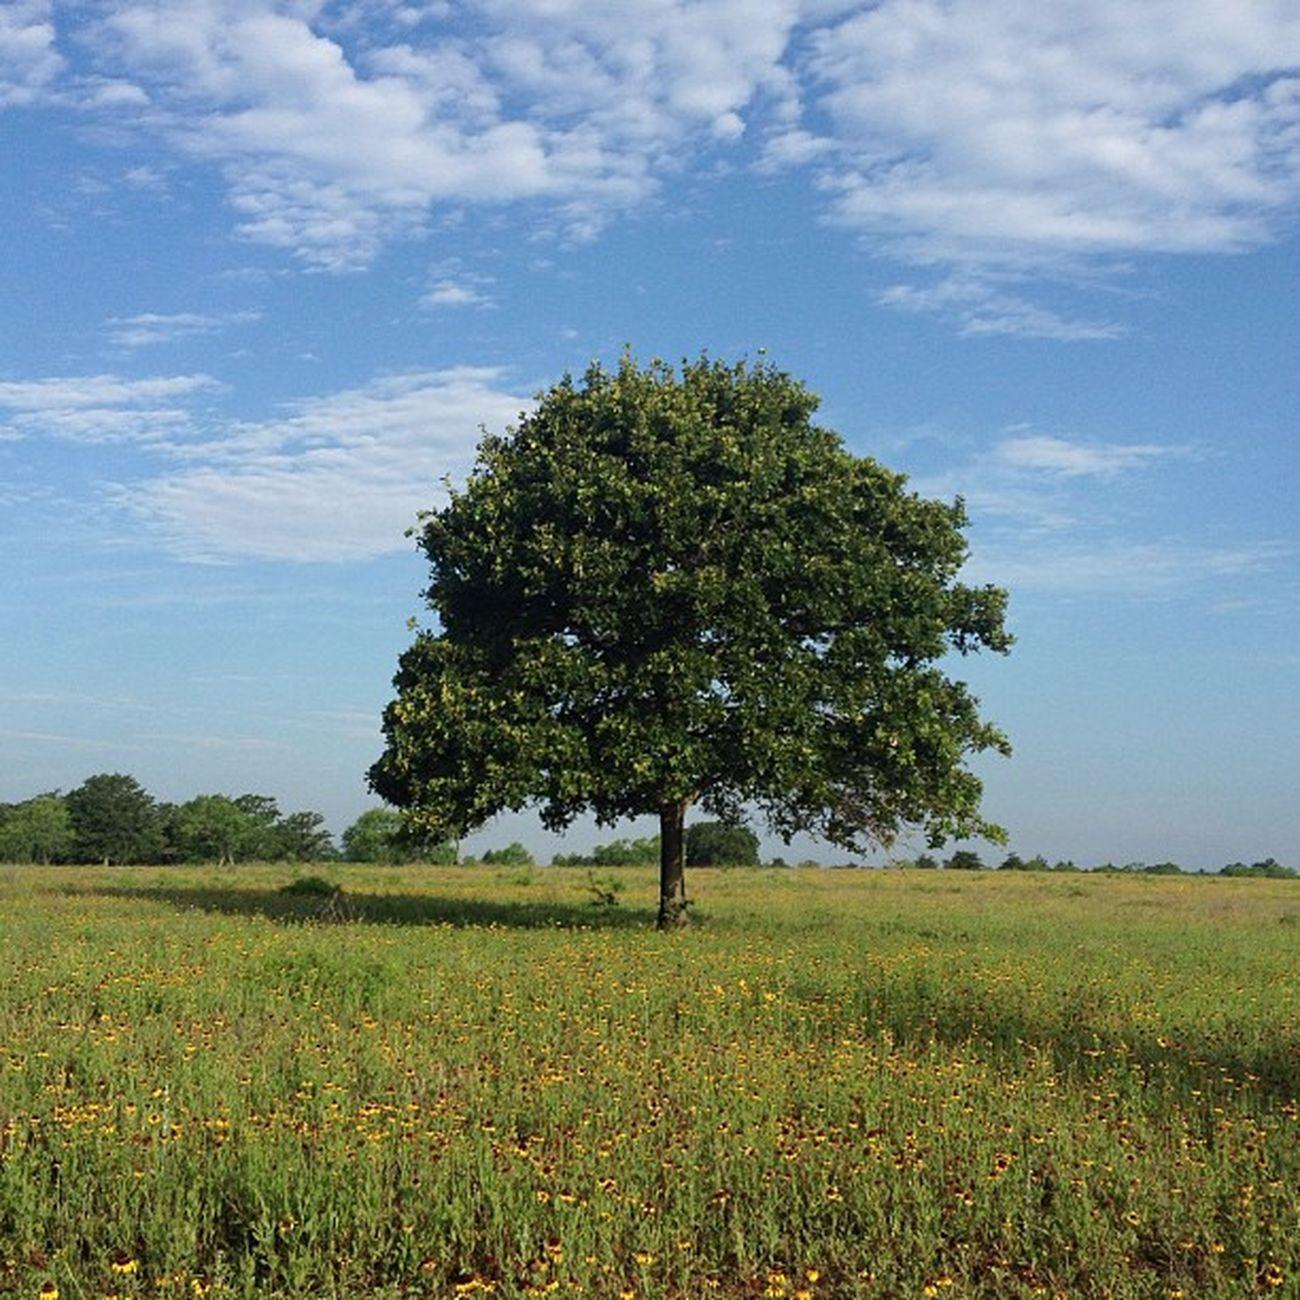 Lone Tree 29 No Filter